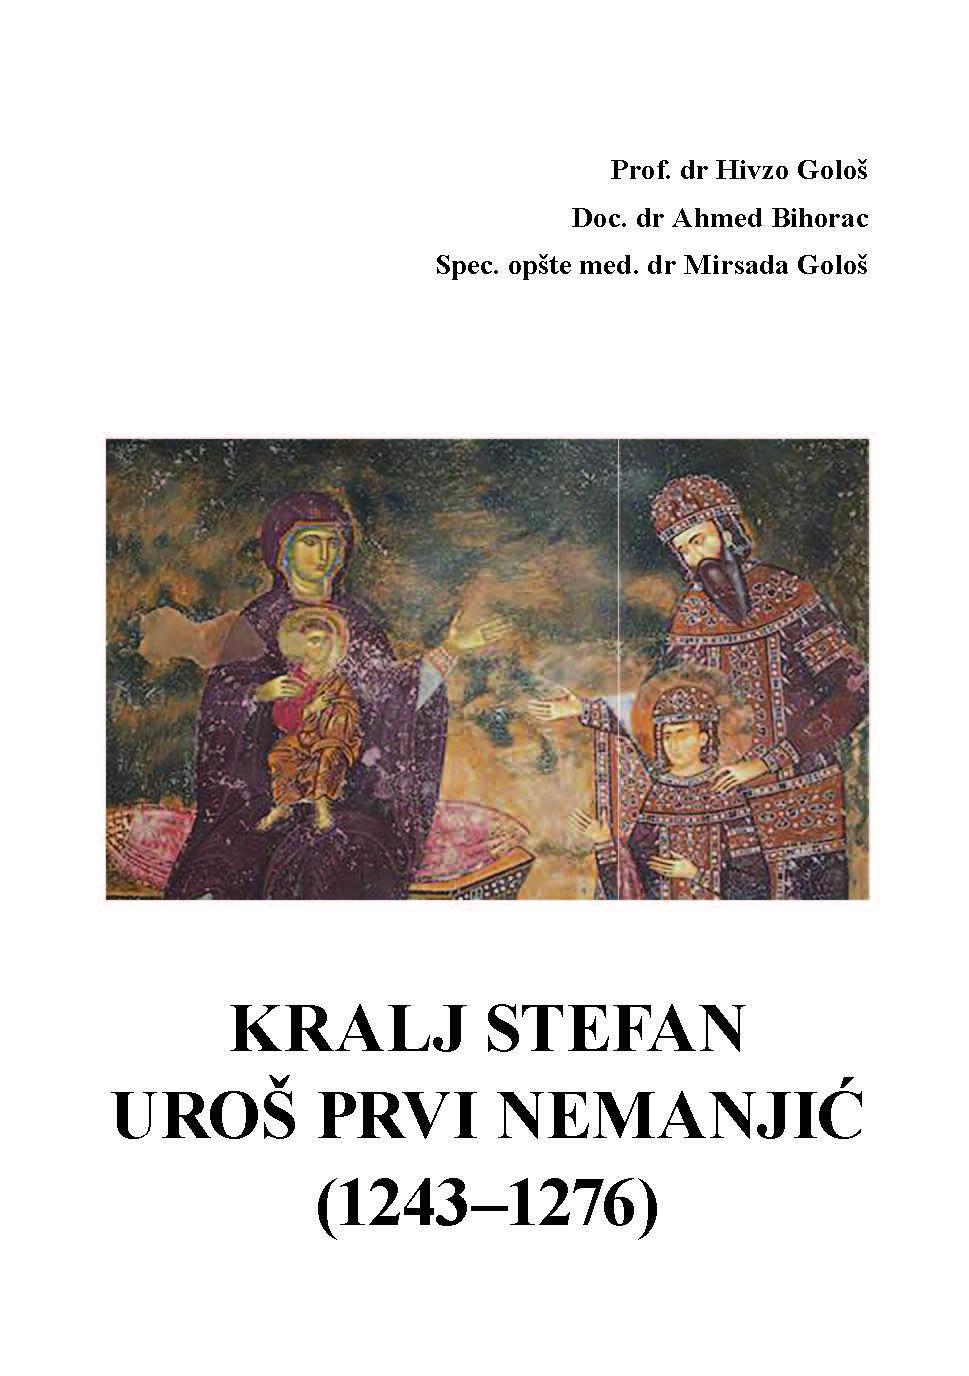 KRALJ STEFAN UROŠ PRVI NEMANJIĆ (1243–1276)